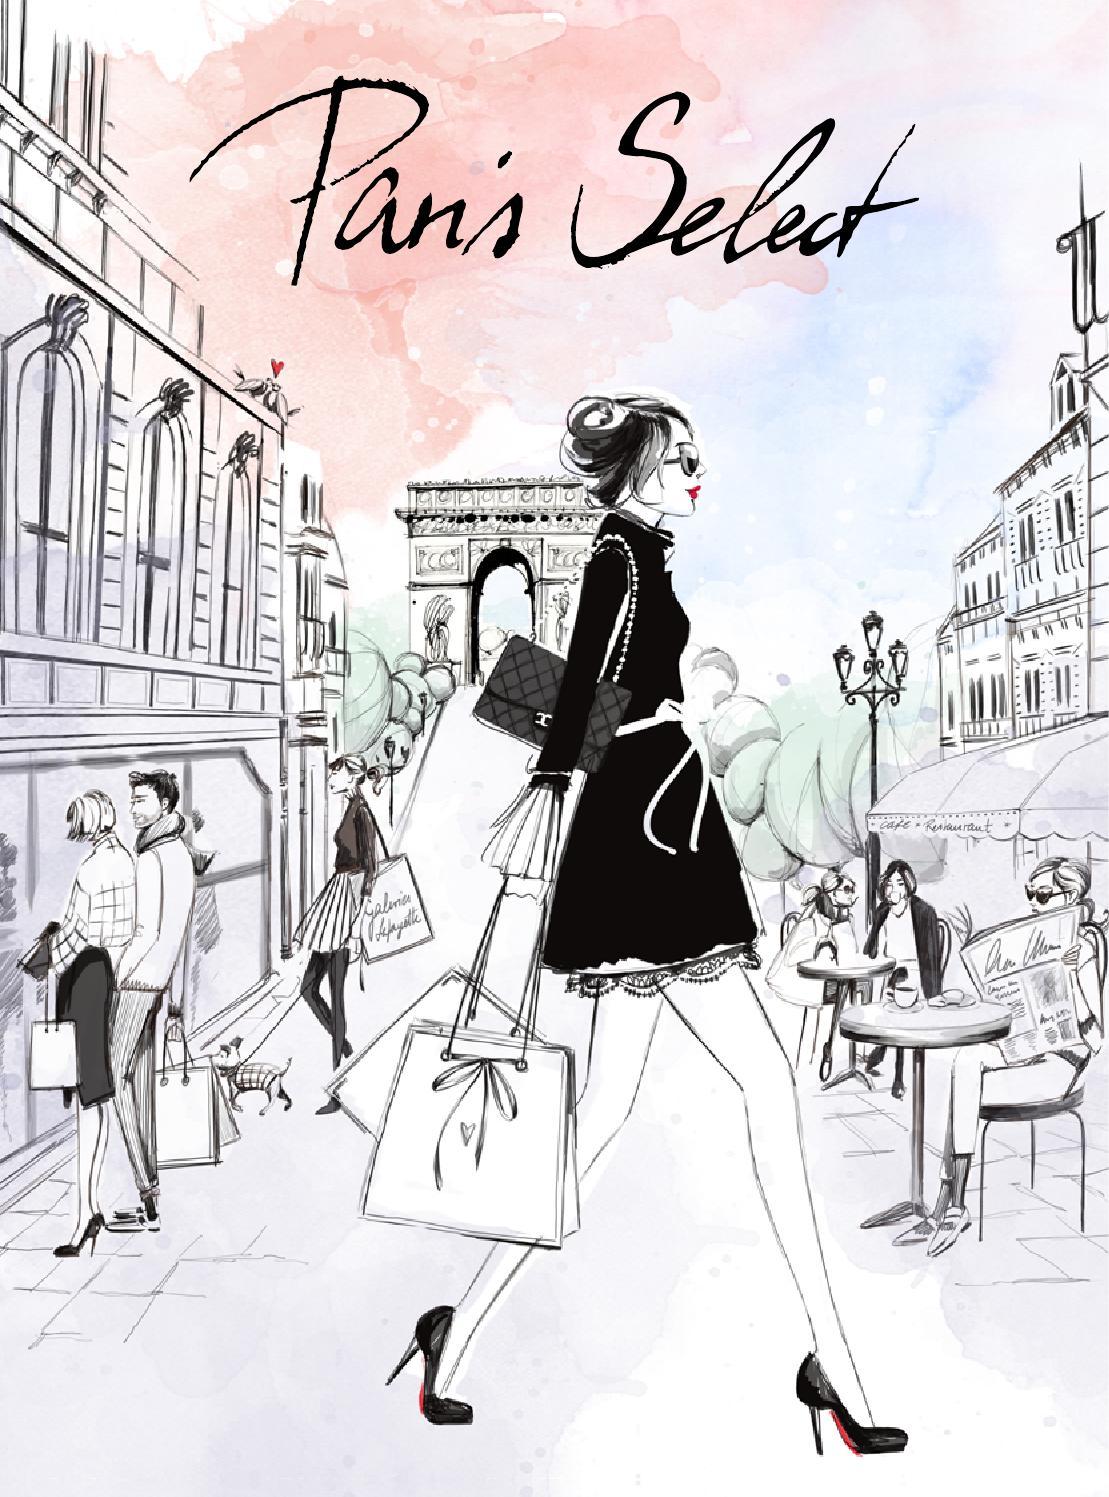 Vita Confort 25 Rue Lecourbe book 2015paris select - issuu